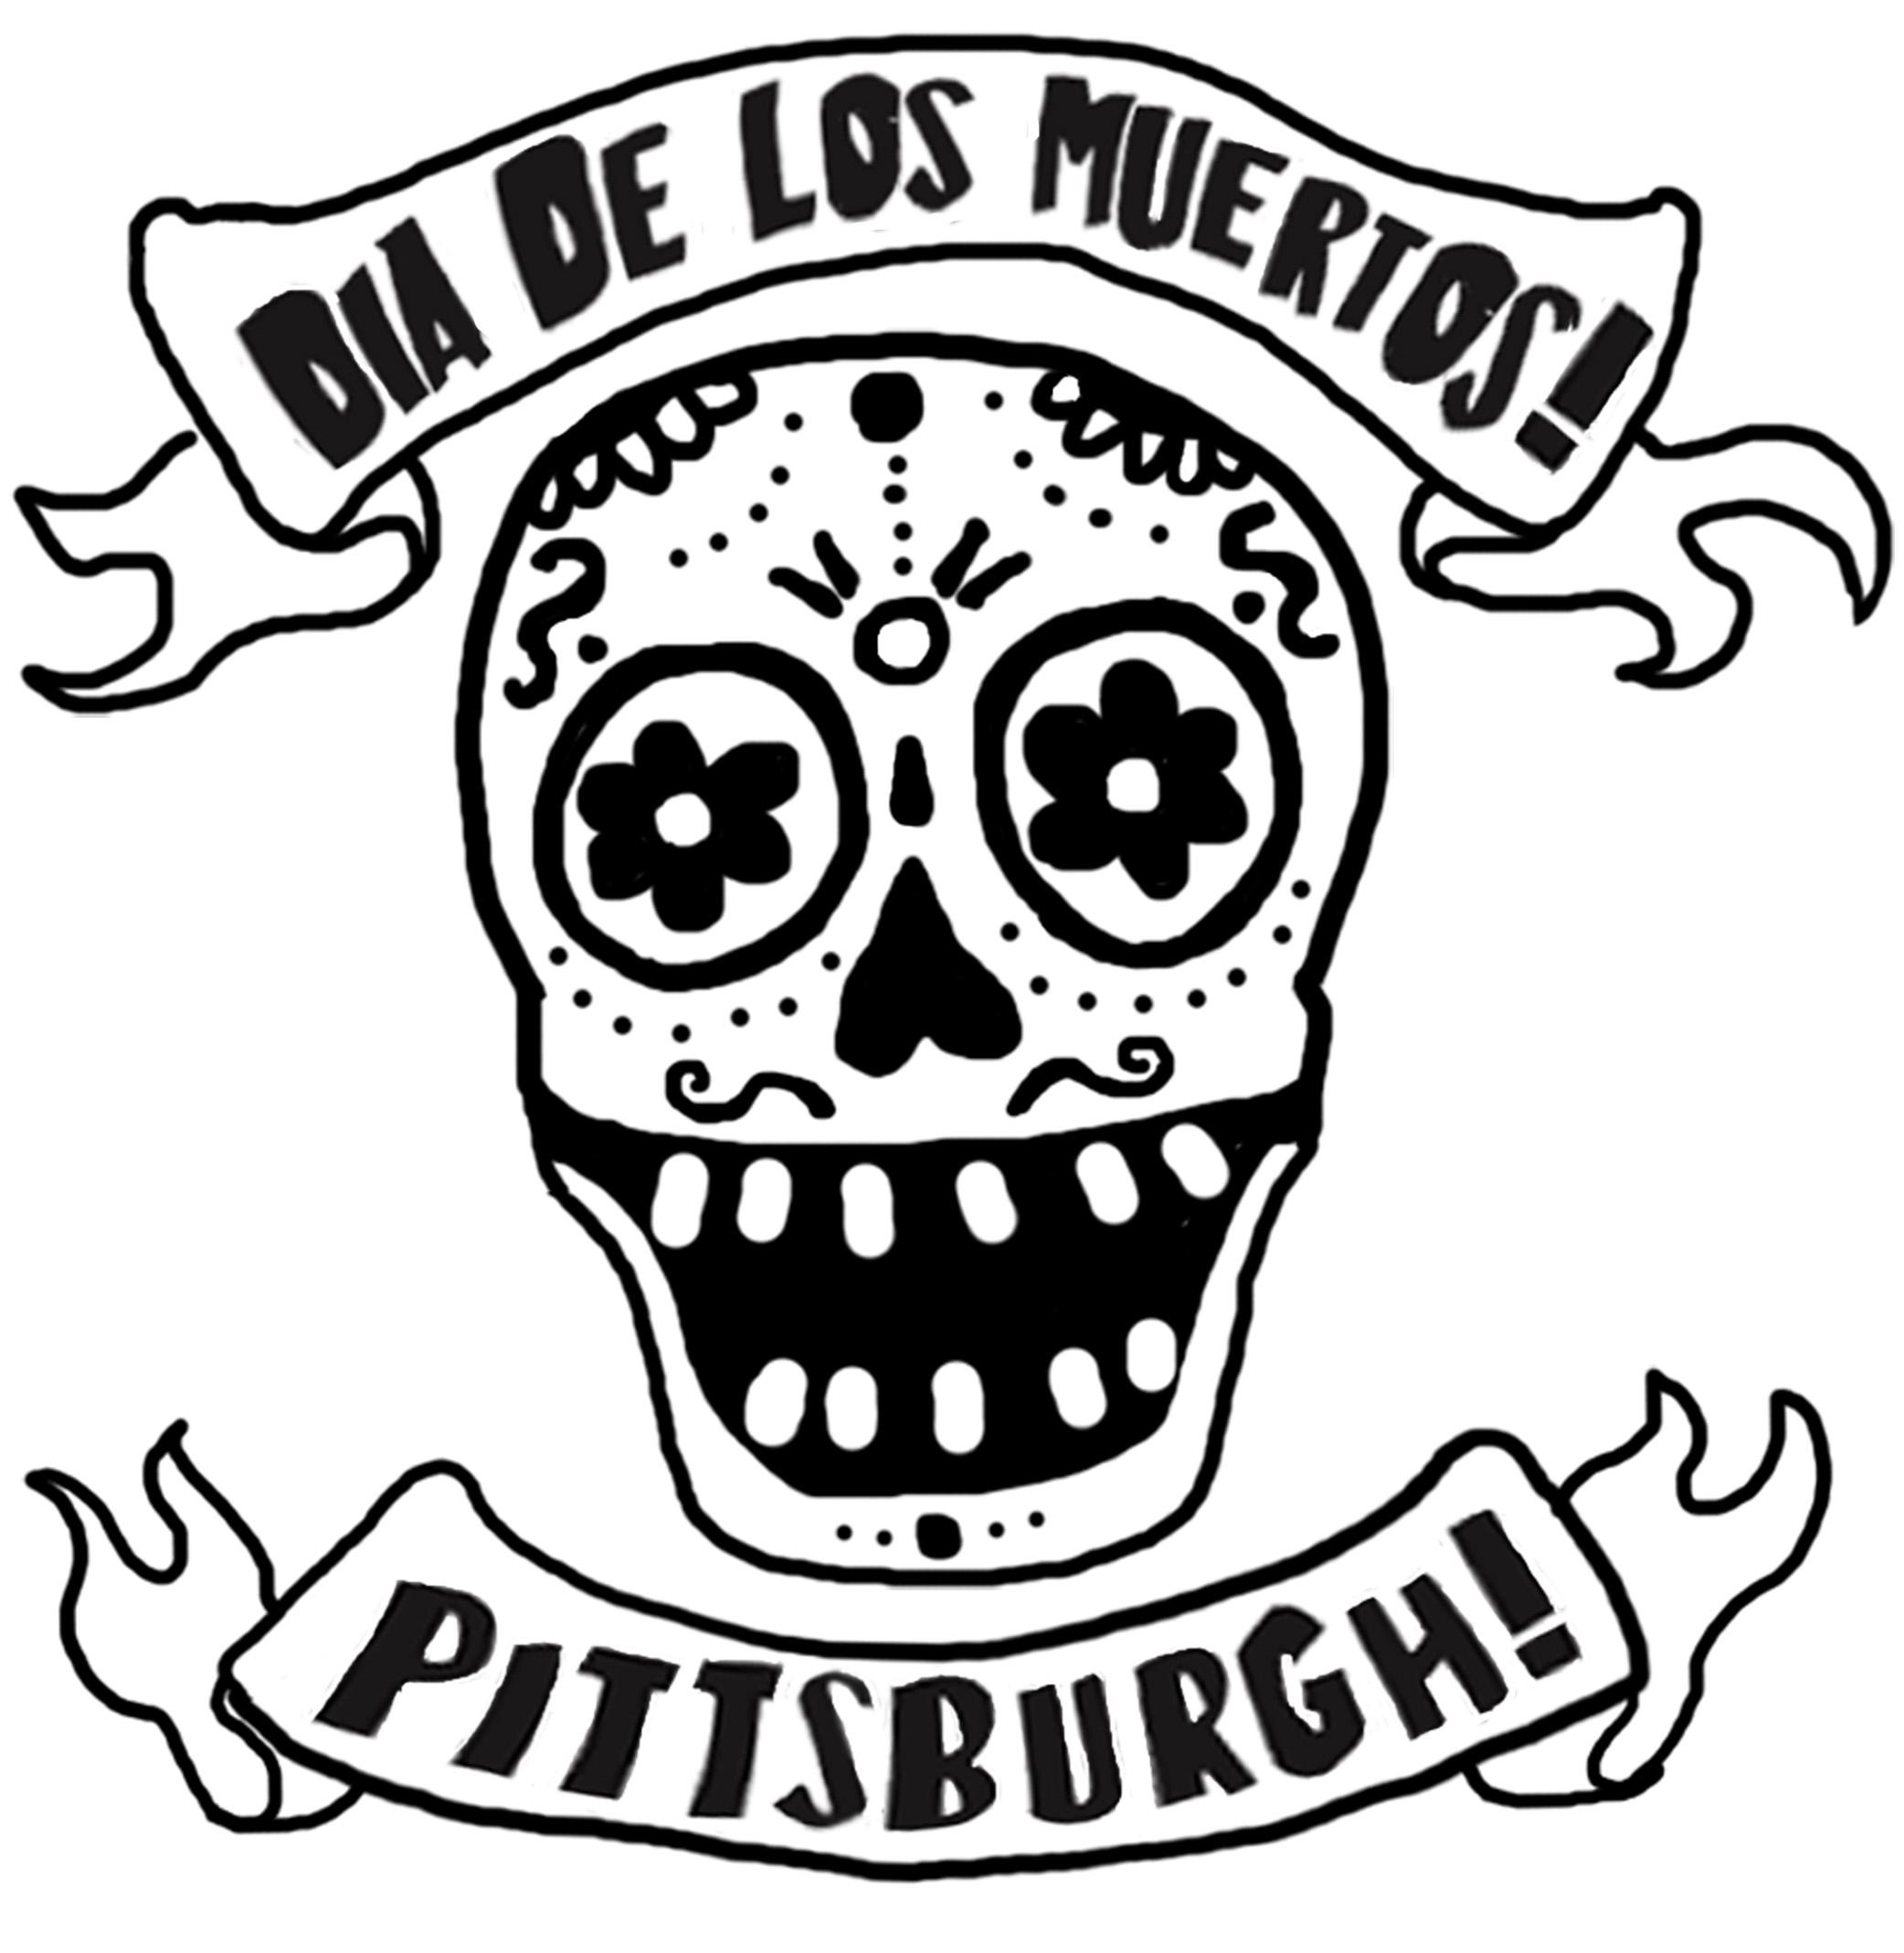 Pittsburgh Center For Creative Reuse Da De Los Muertos Pittsburgh